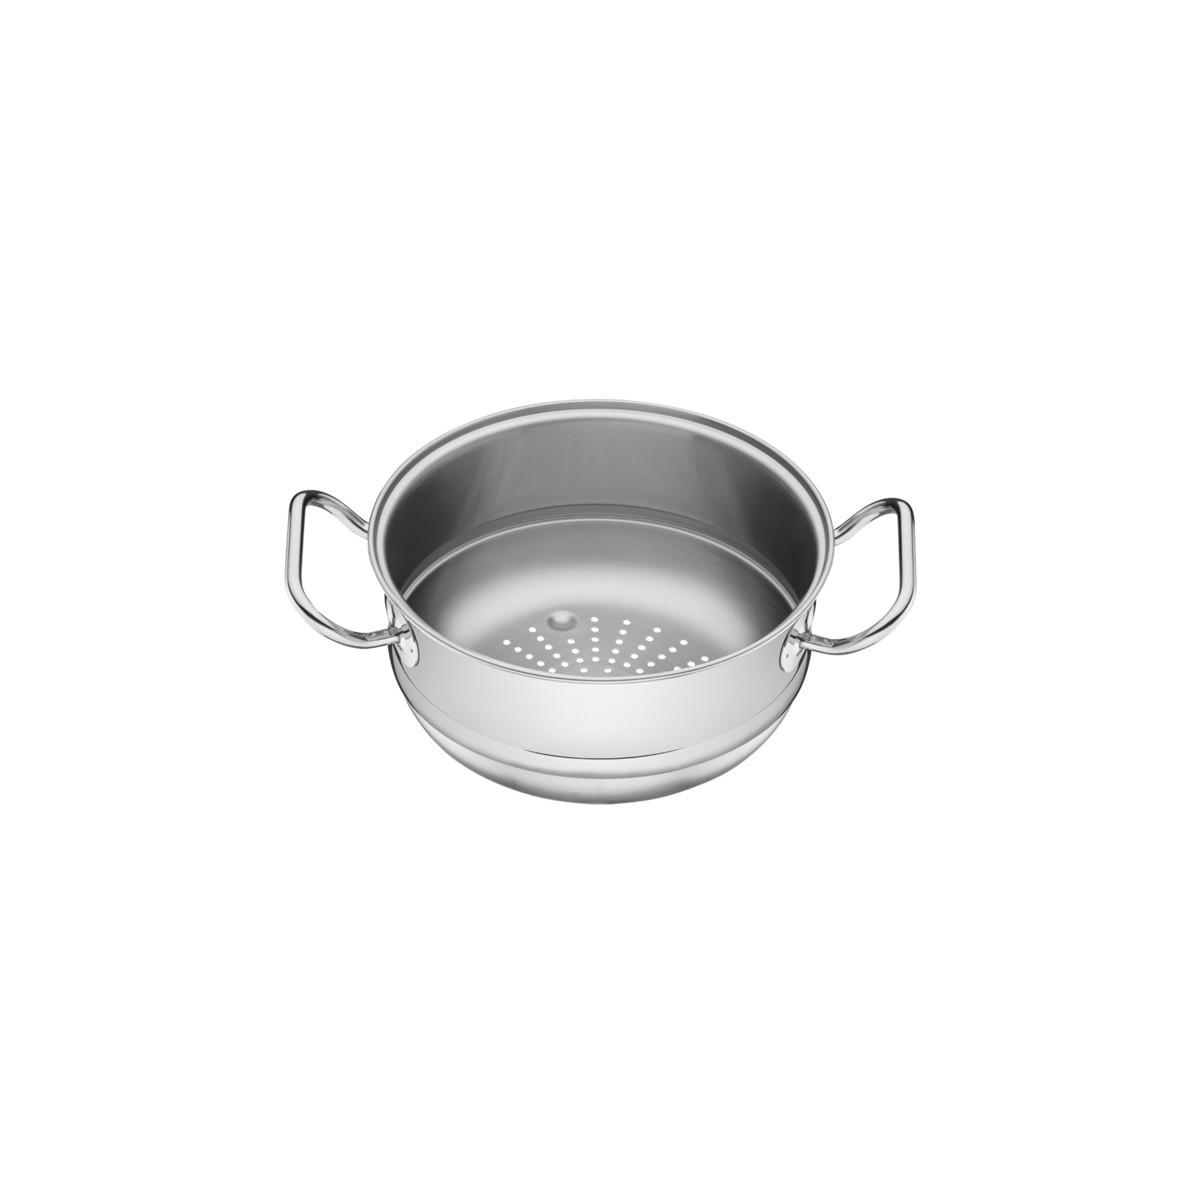 Cozi-Vapore Aço Inox Professional 16cm 1,6L